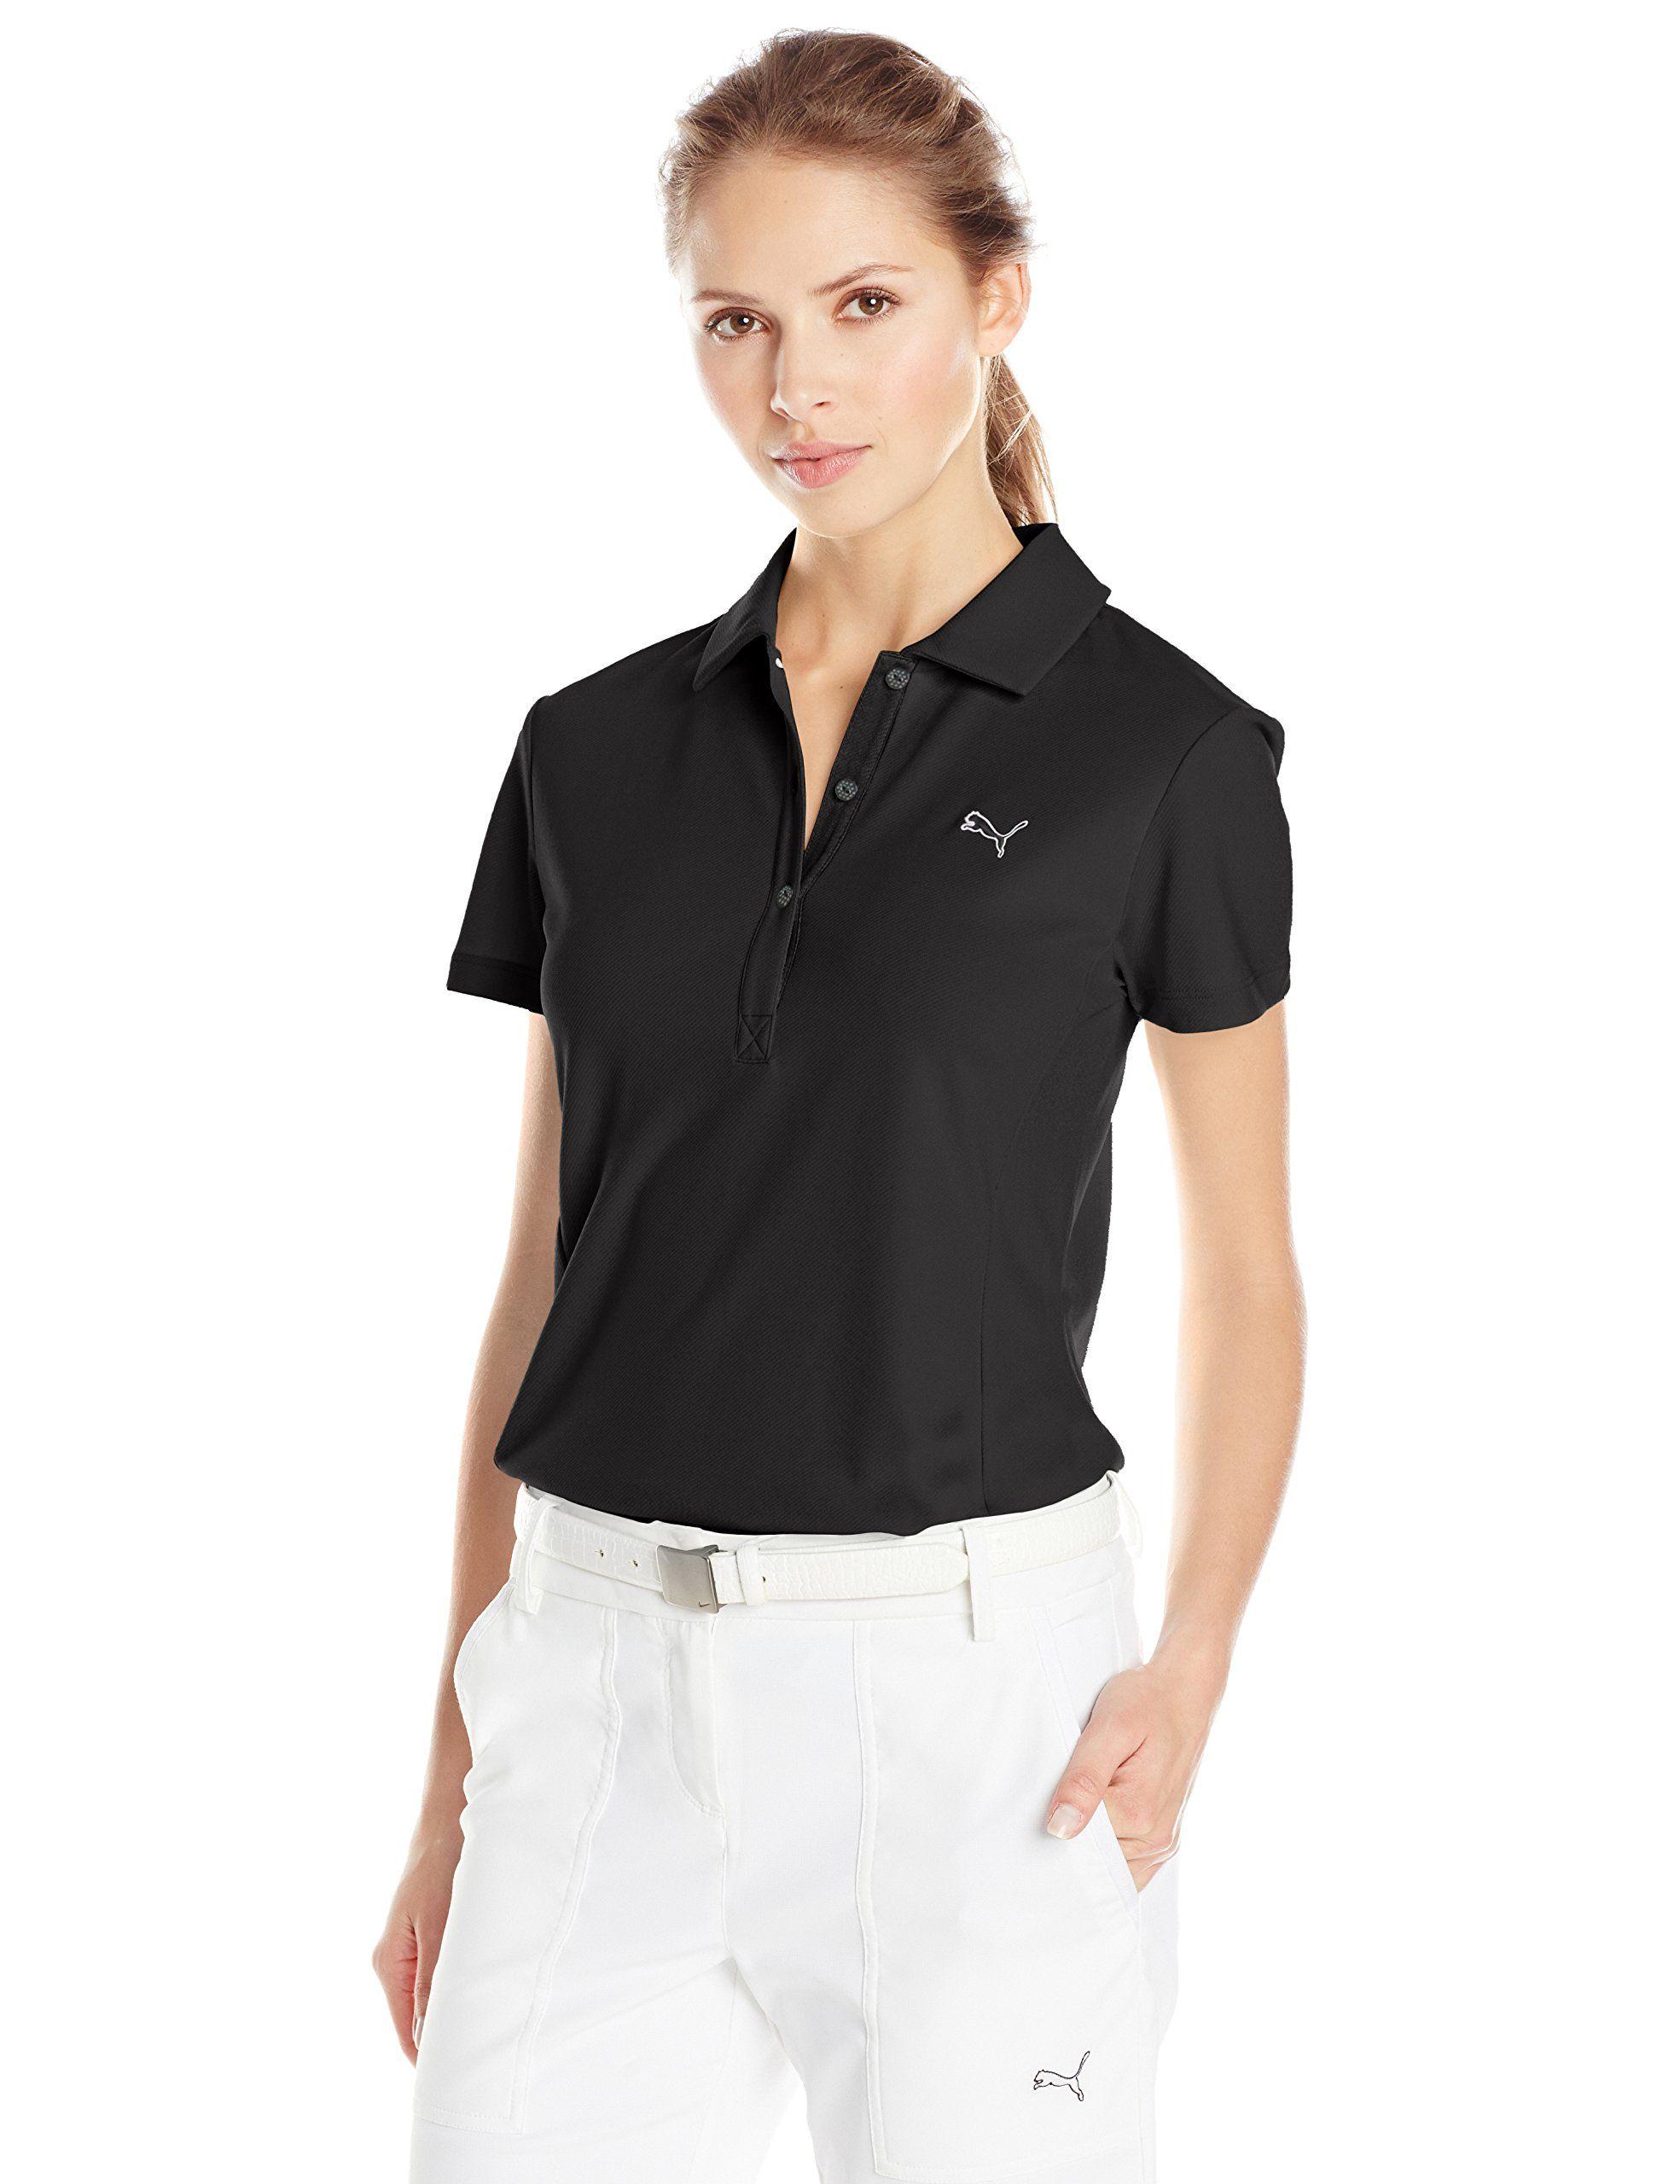 adc4eed2 Women Golf Clothing - PUMA Golf Womens Tech Polo Black XSmall | golf ...